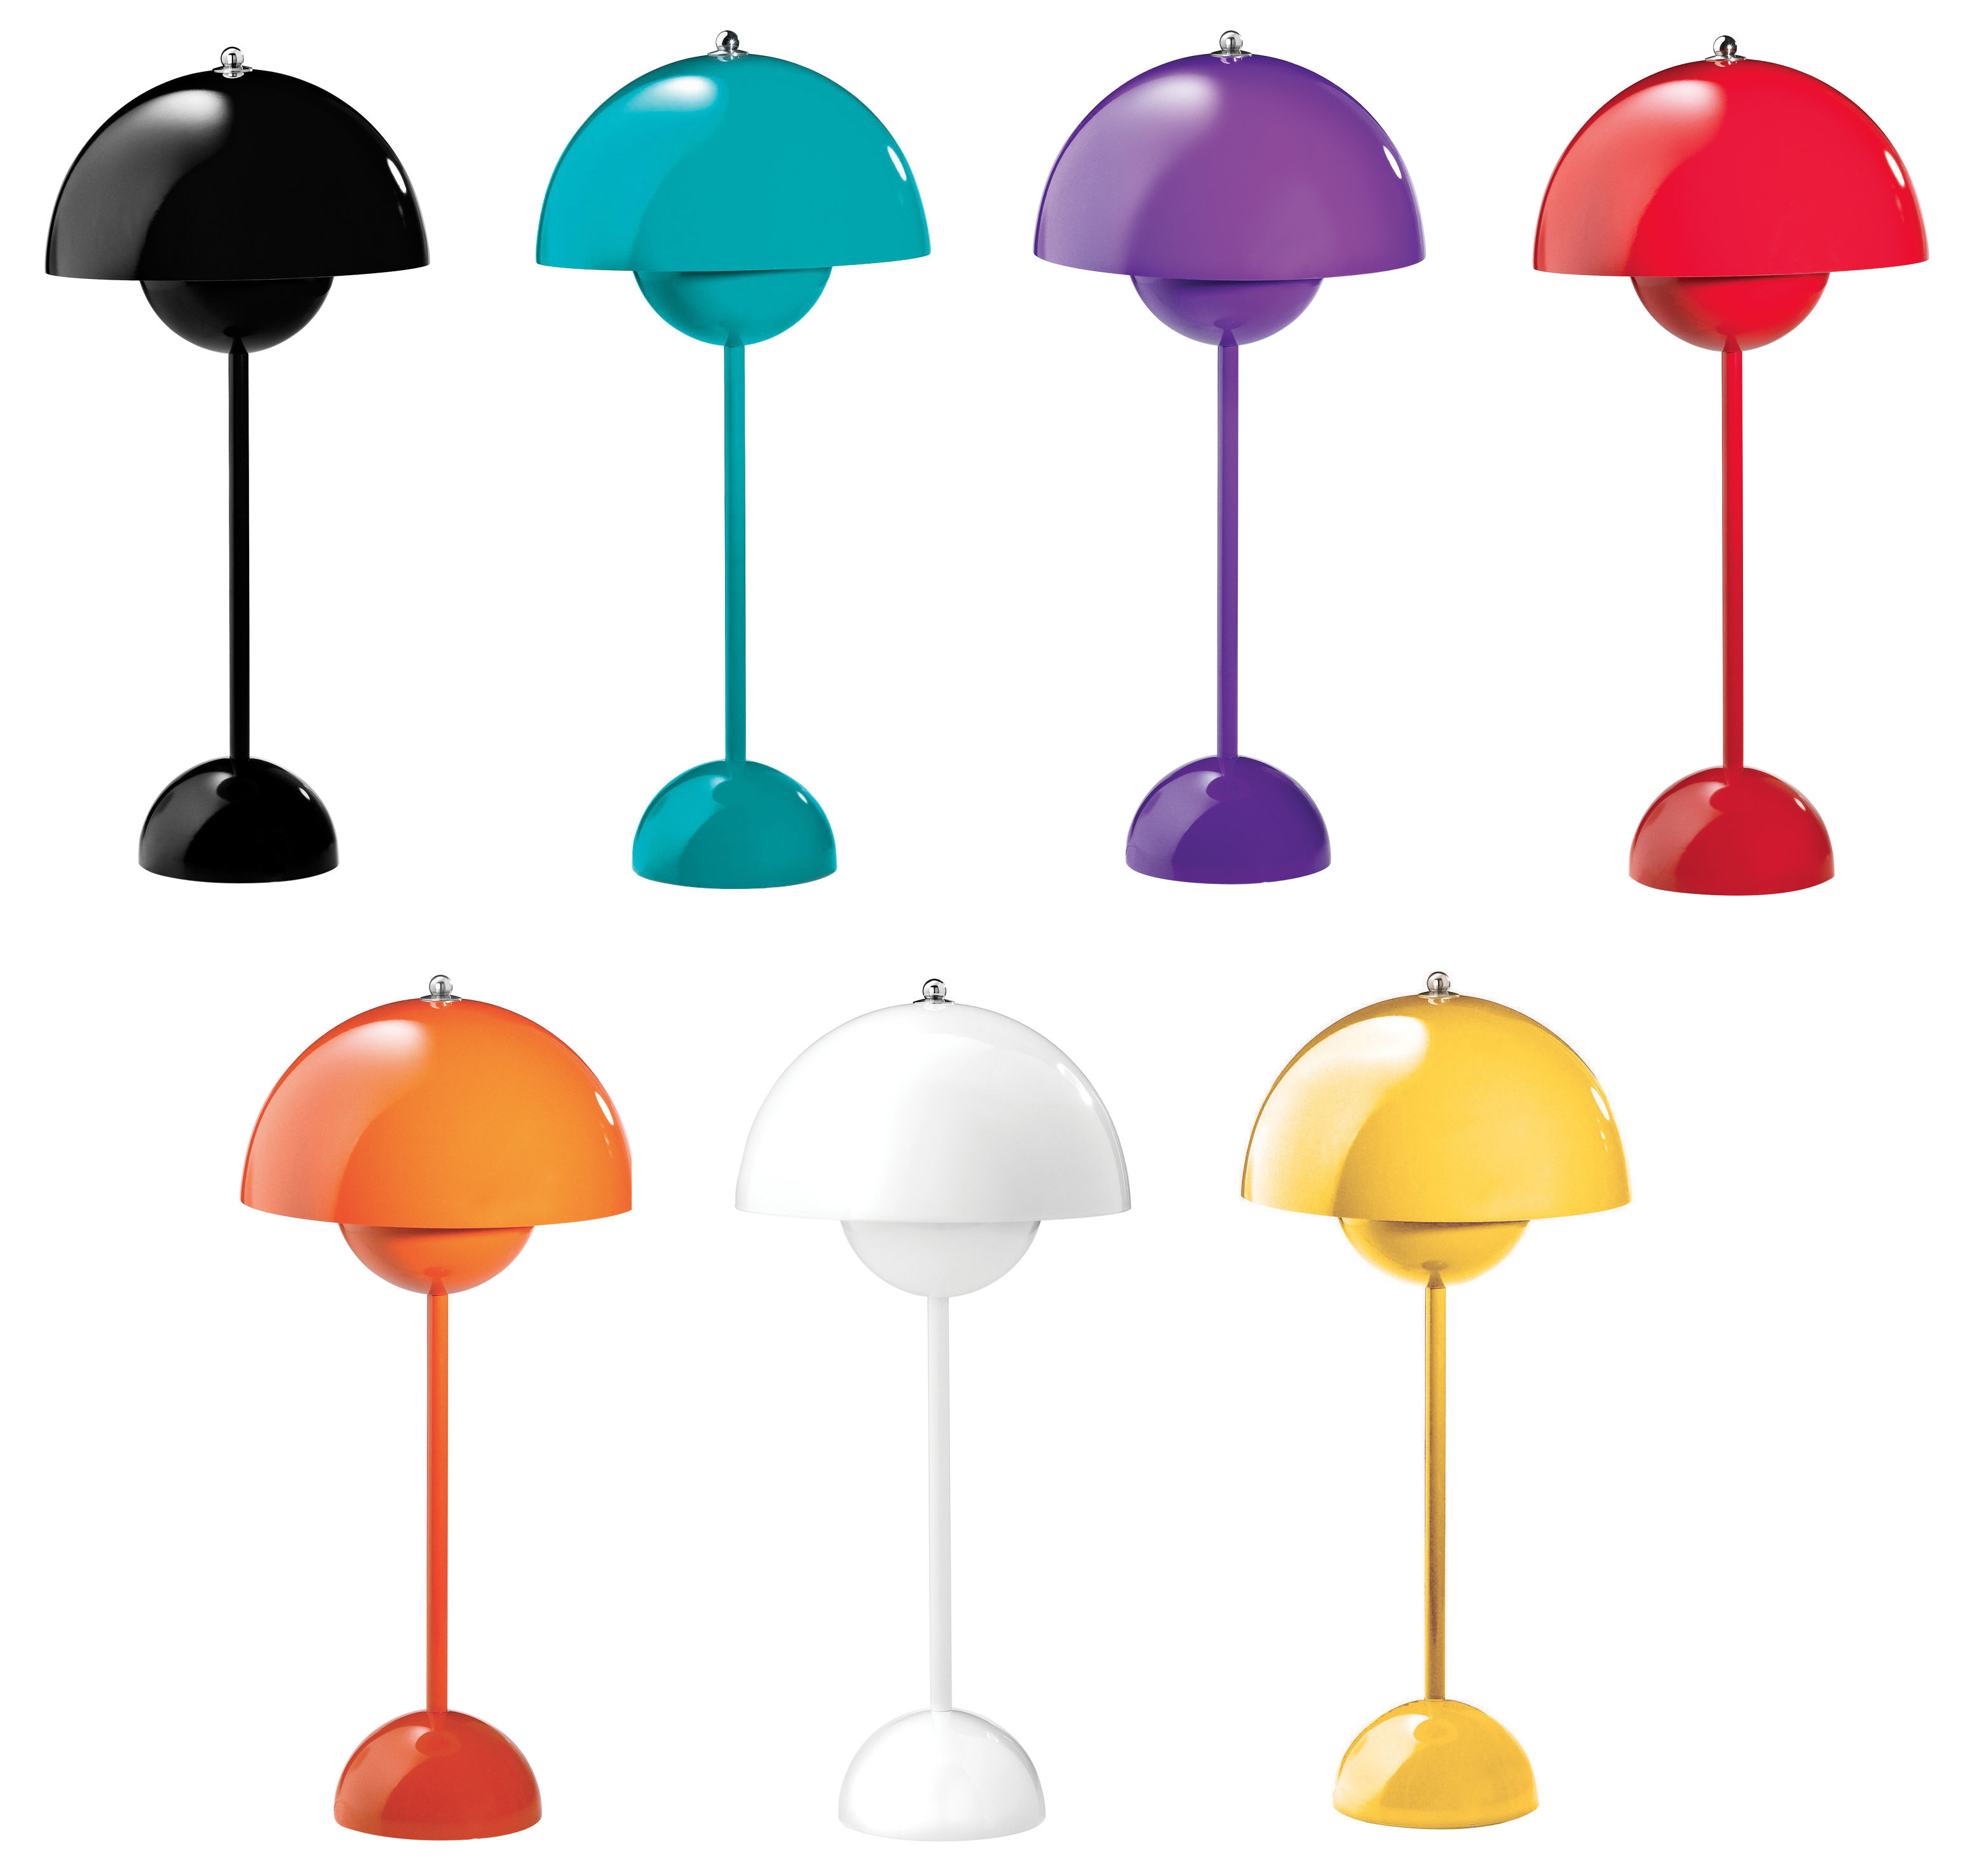 Picture of: Hauptdesign Flowerpot Lampe Vp3 Full Version Hd Quality Lampe Vp3 Sesselroy Villamediceaammiraglio It